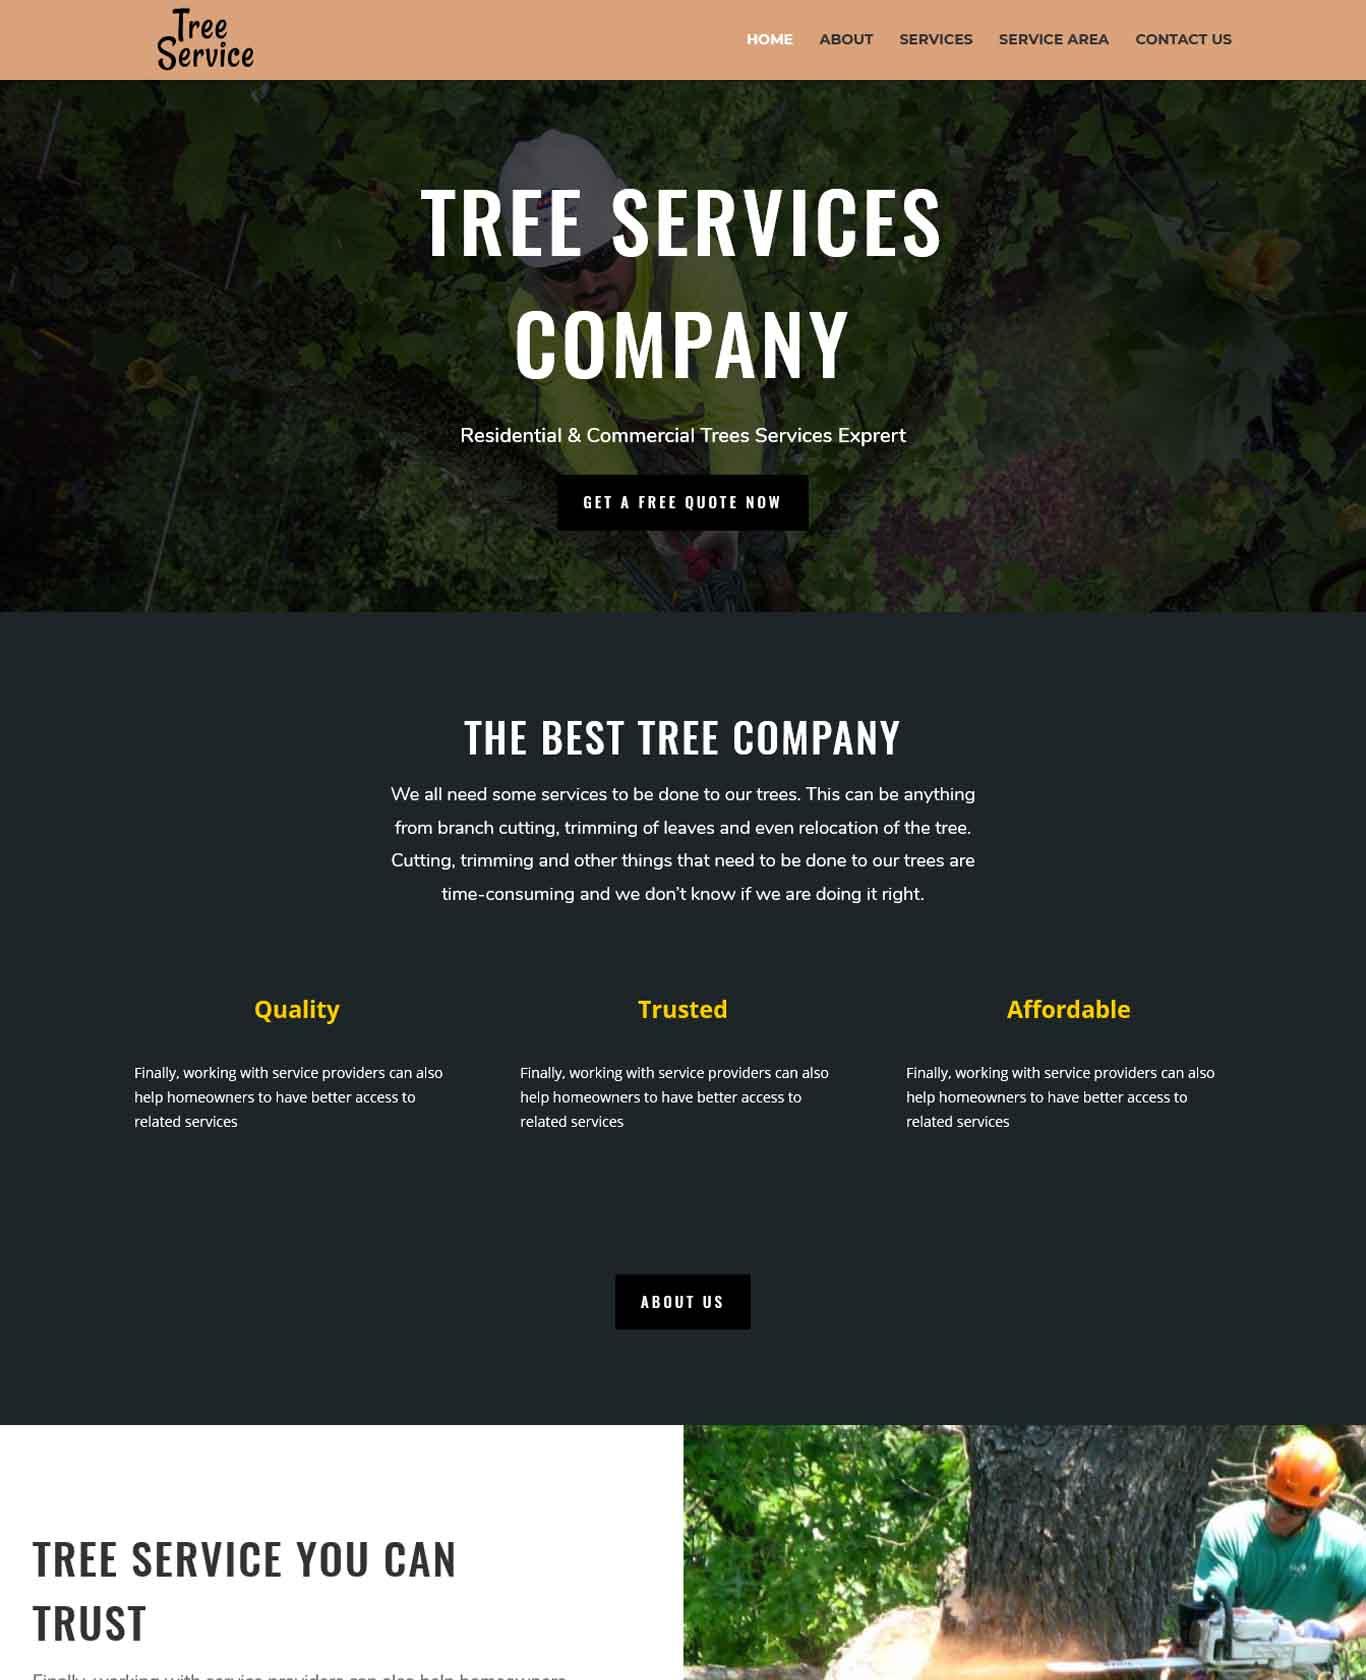 Tree Services Company Website Example